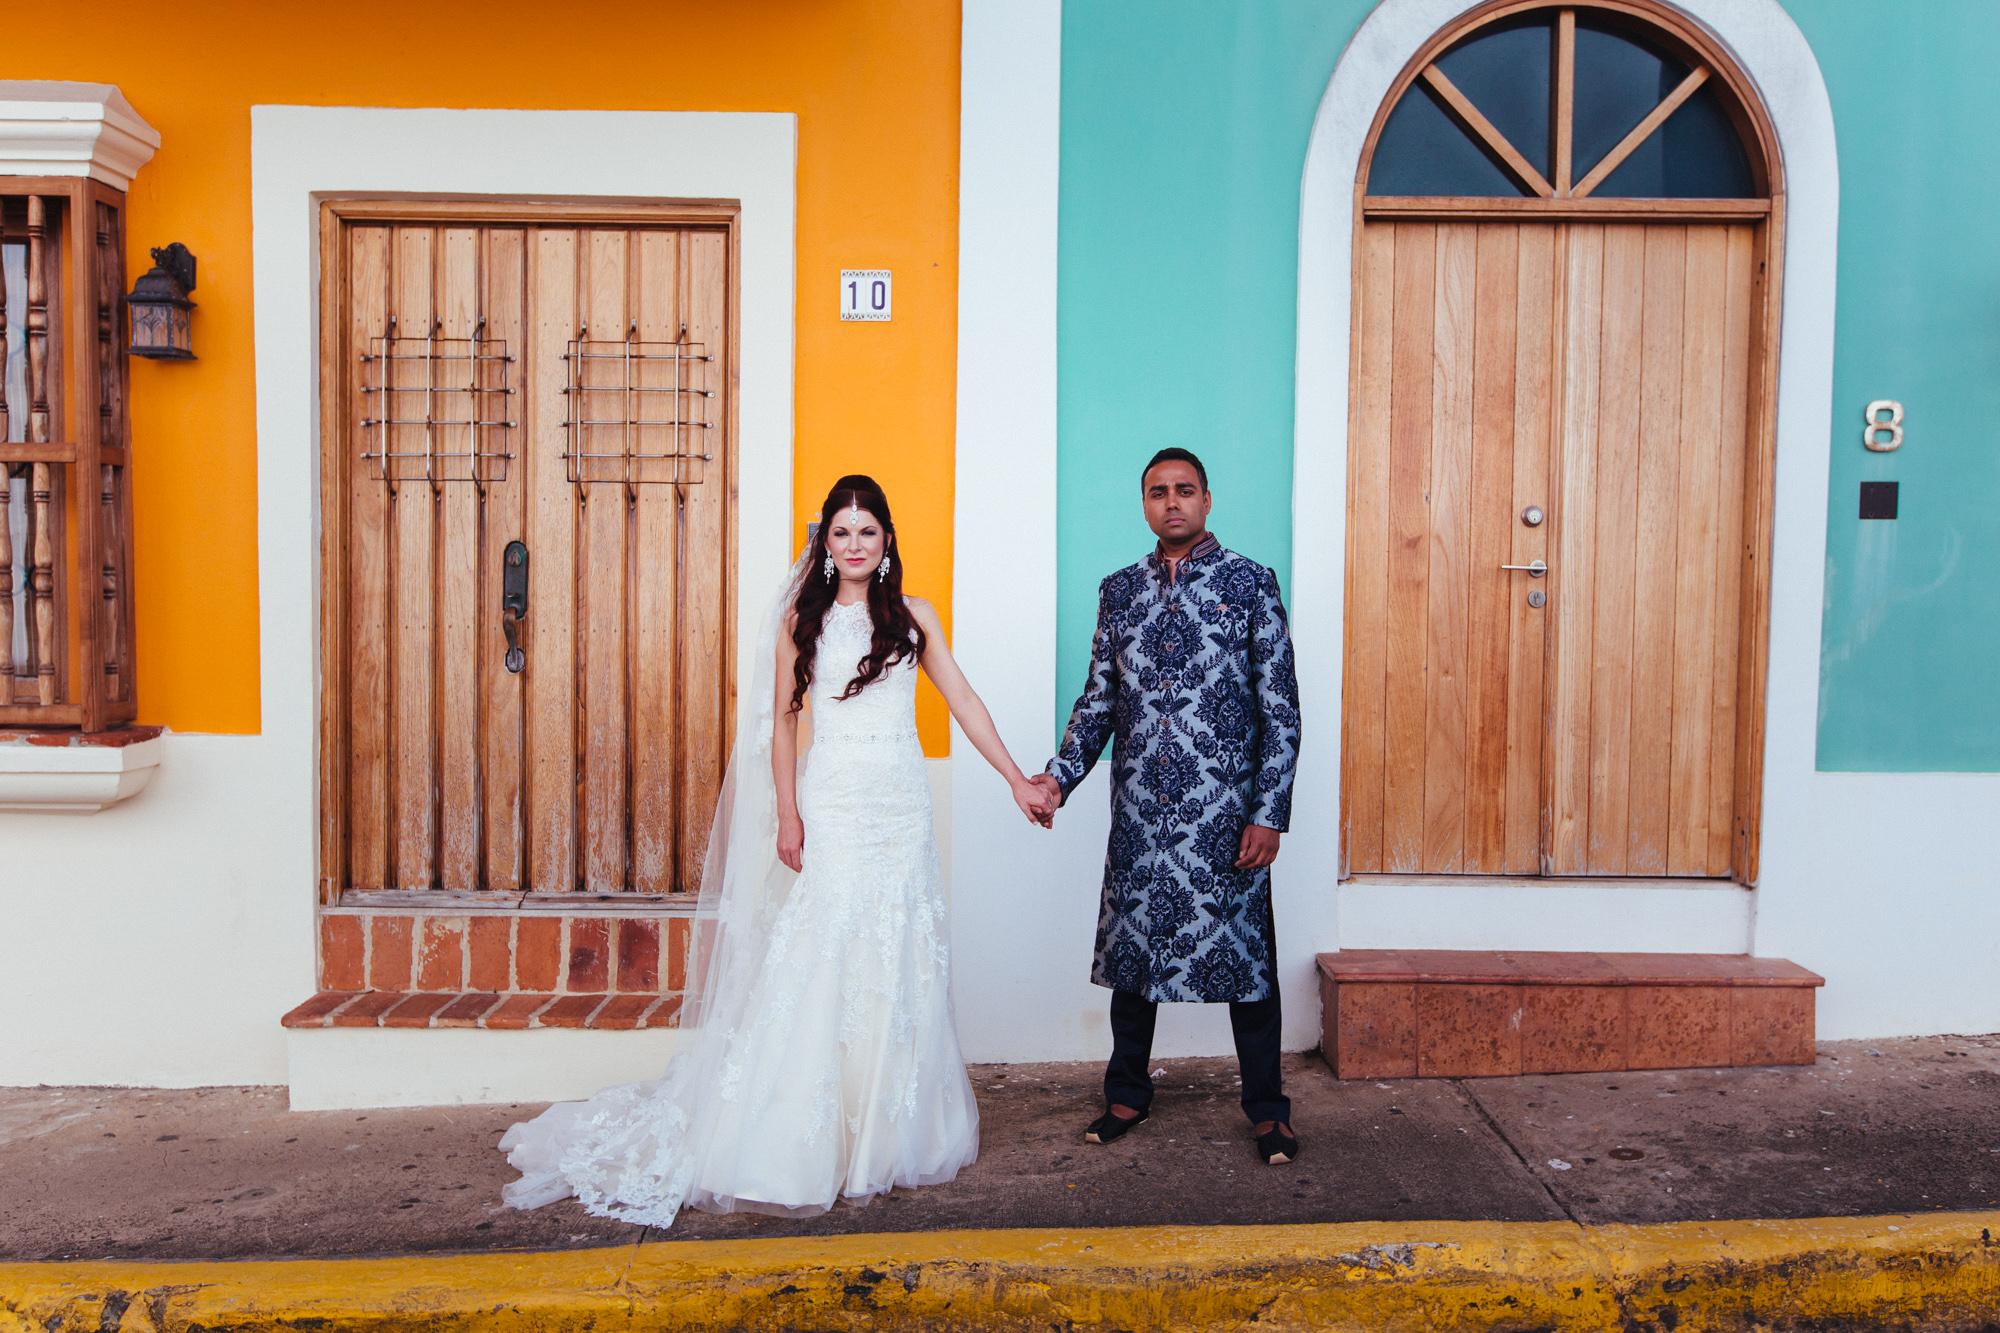 Puerto Rico Wedding Photography Destination Photographer Boris Zaretsky San Juan PR Casino Antiguo La Concha IMG_0257.jpg